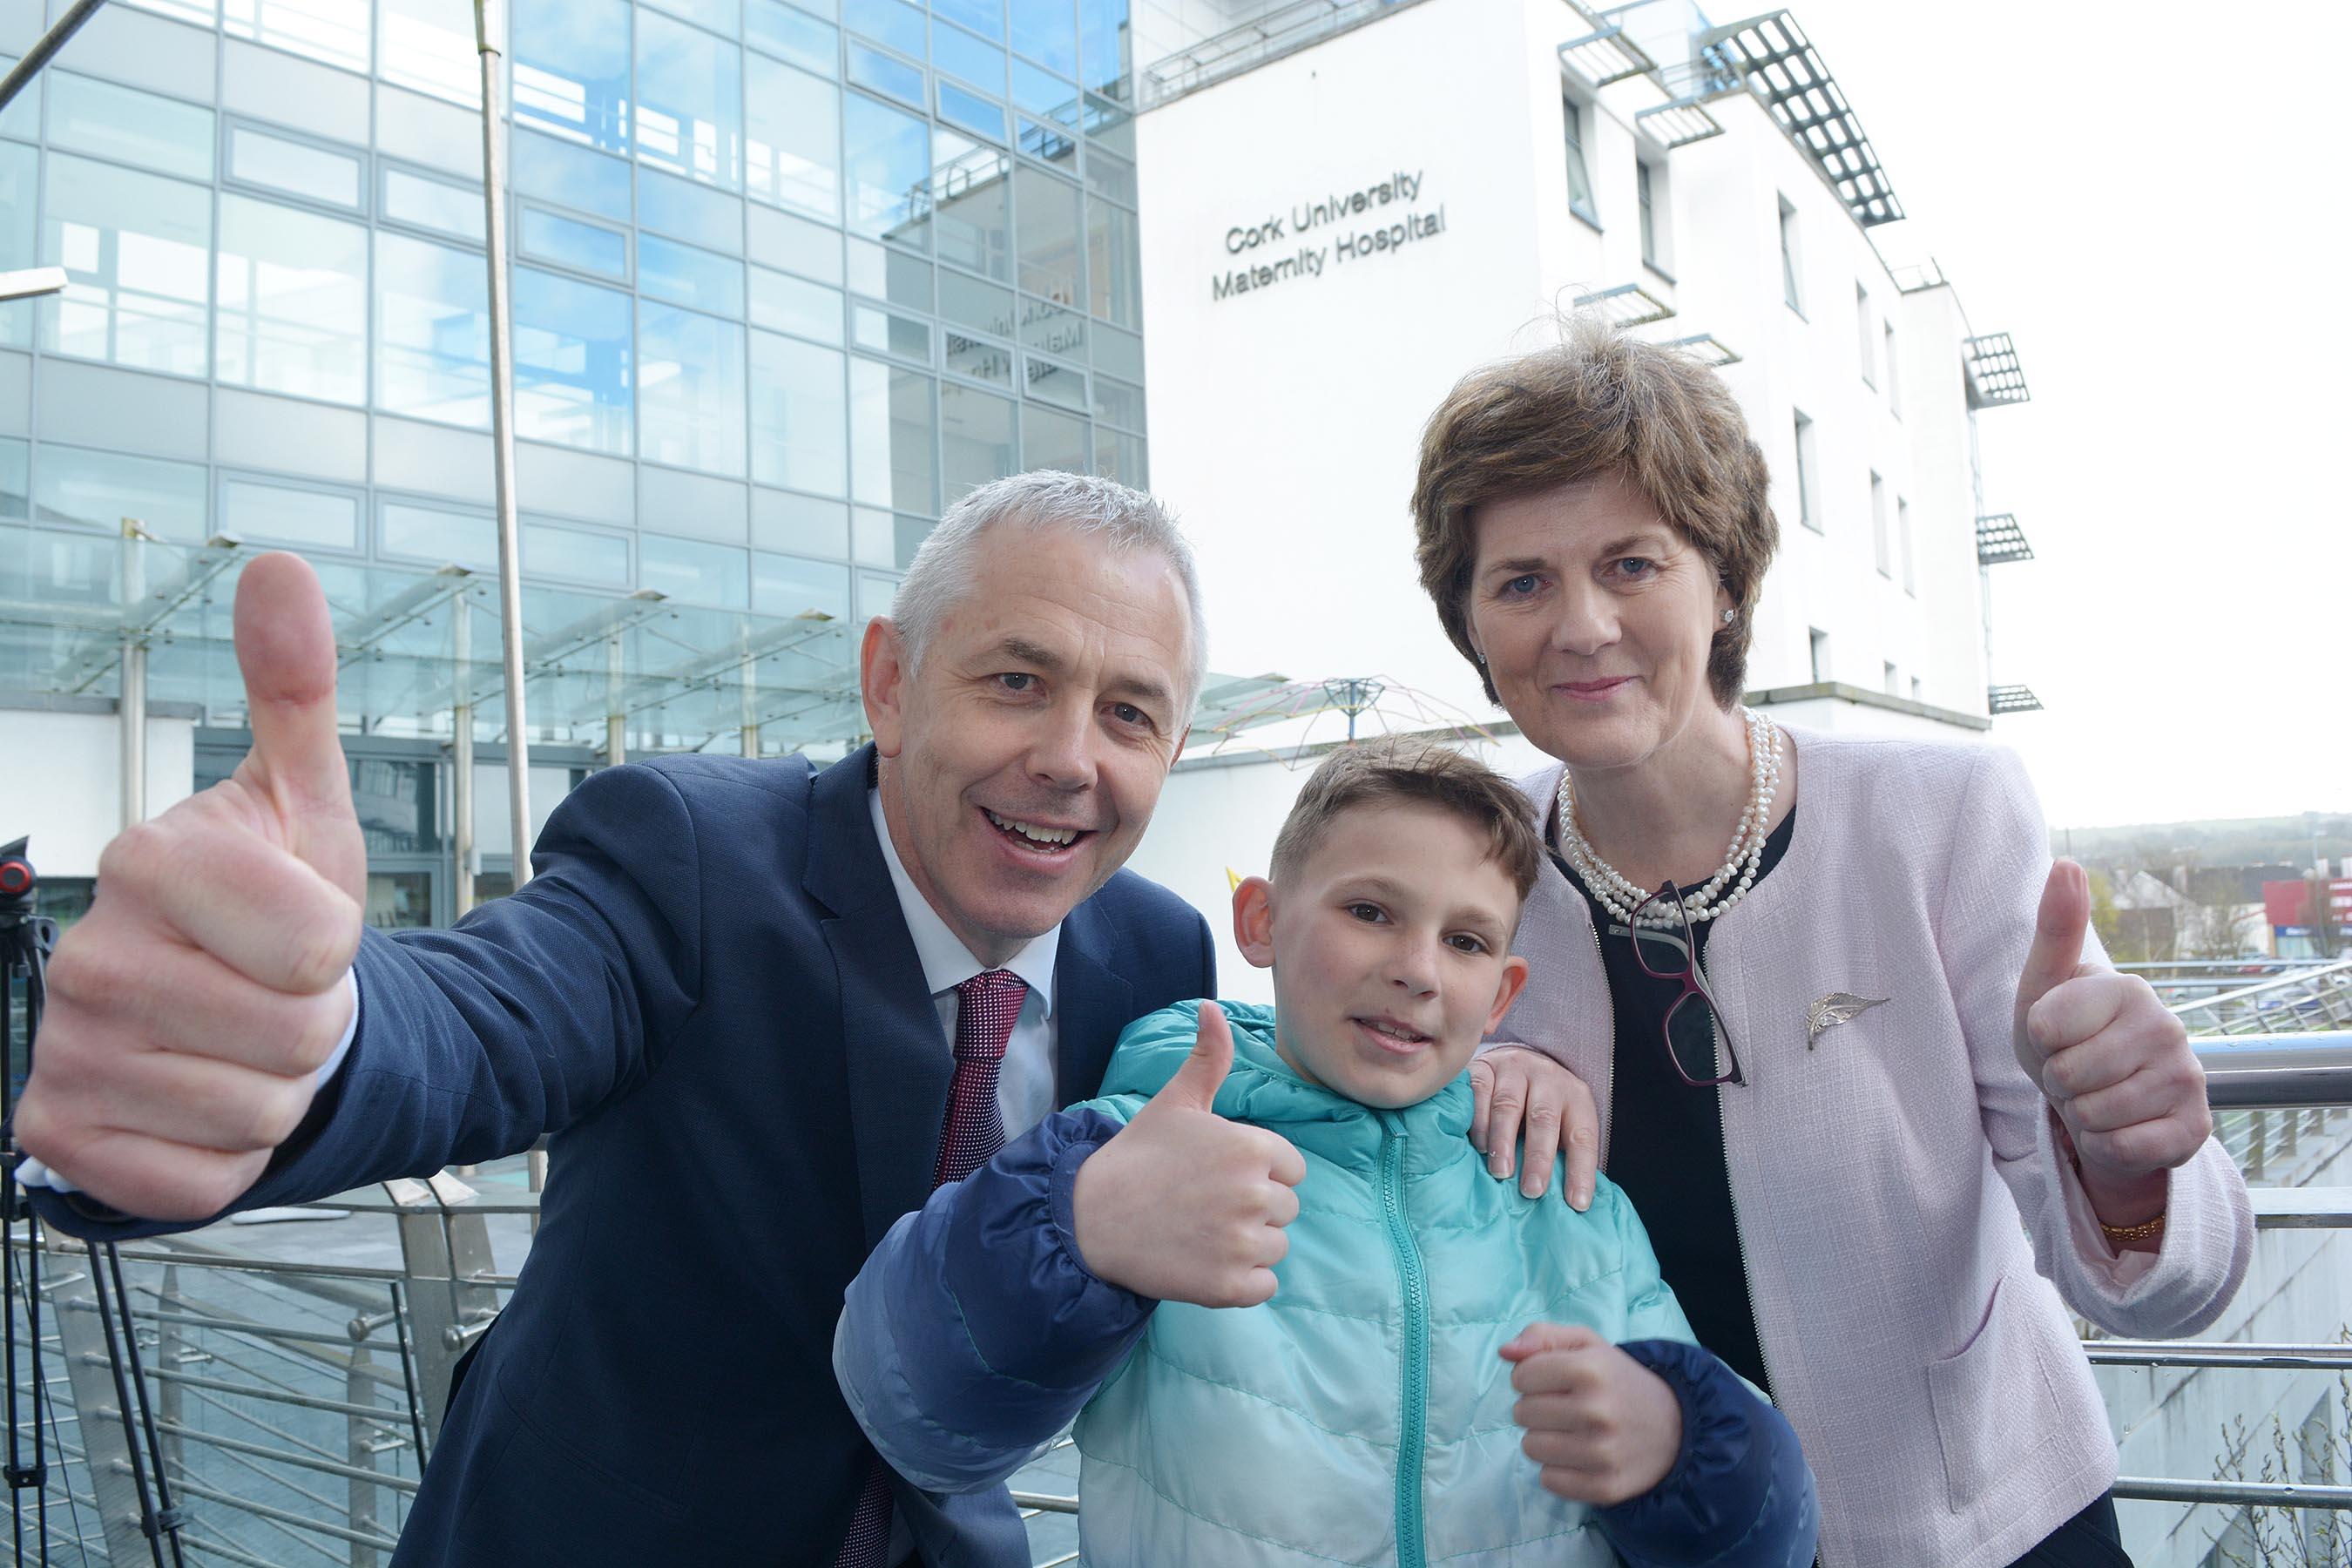 Cork University Maternity Hospital – CUMH – celebrates its own 10th